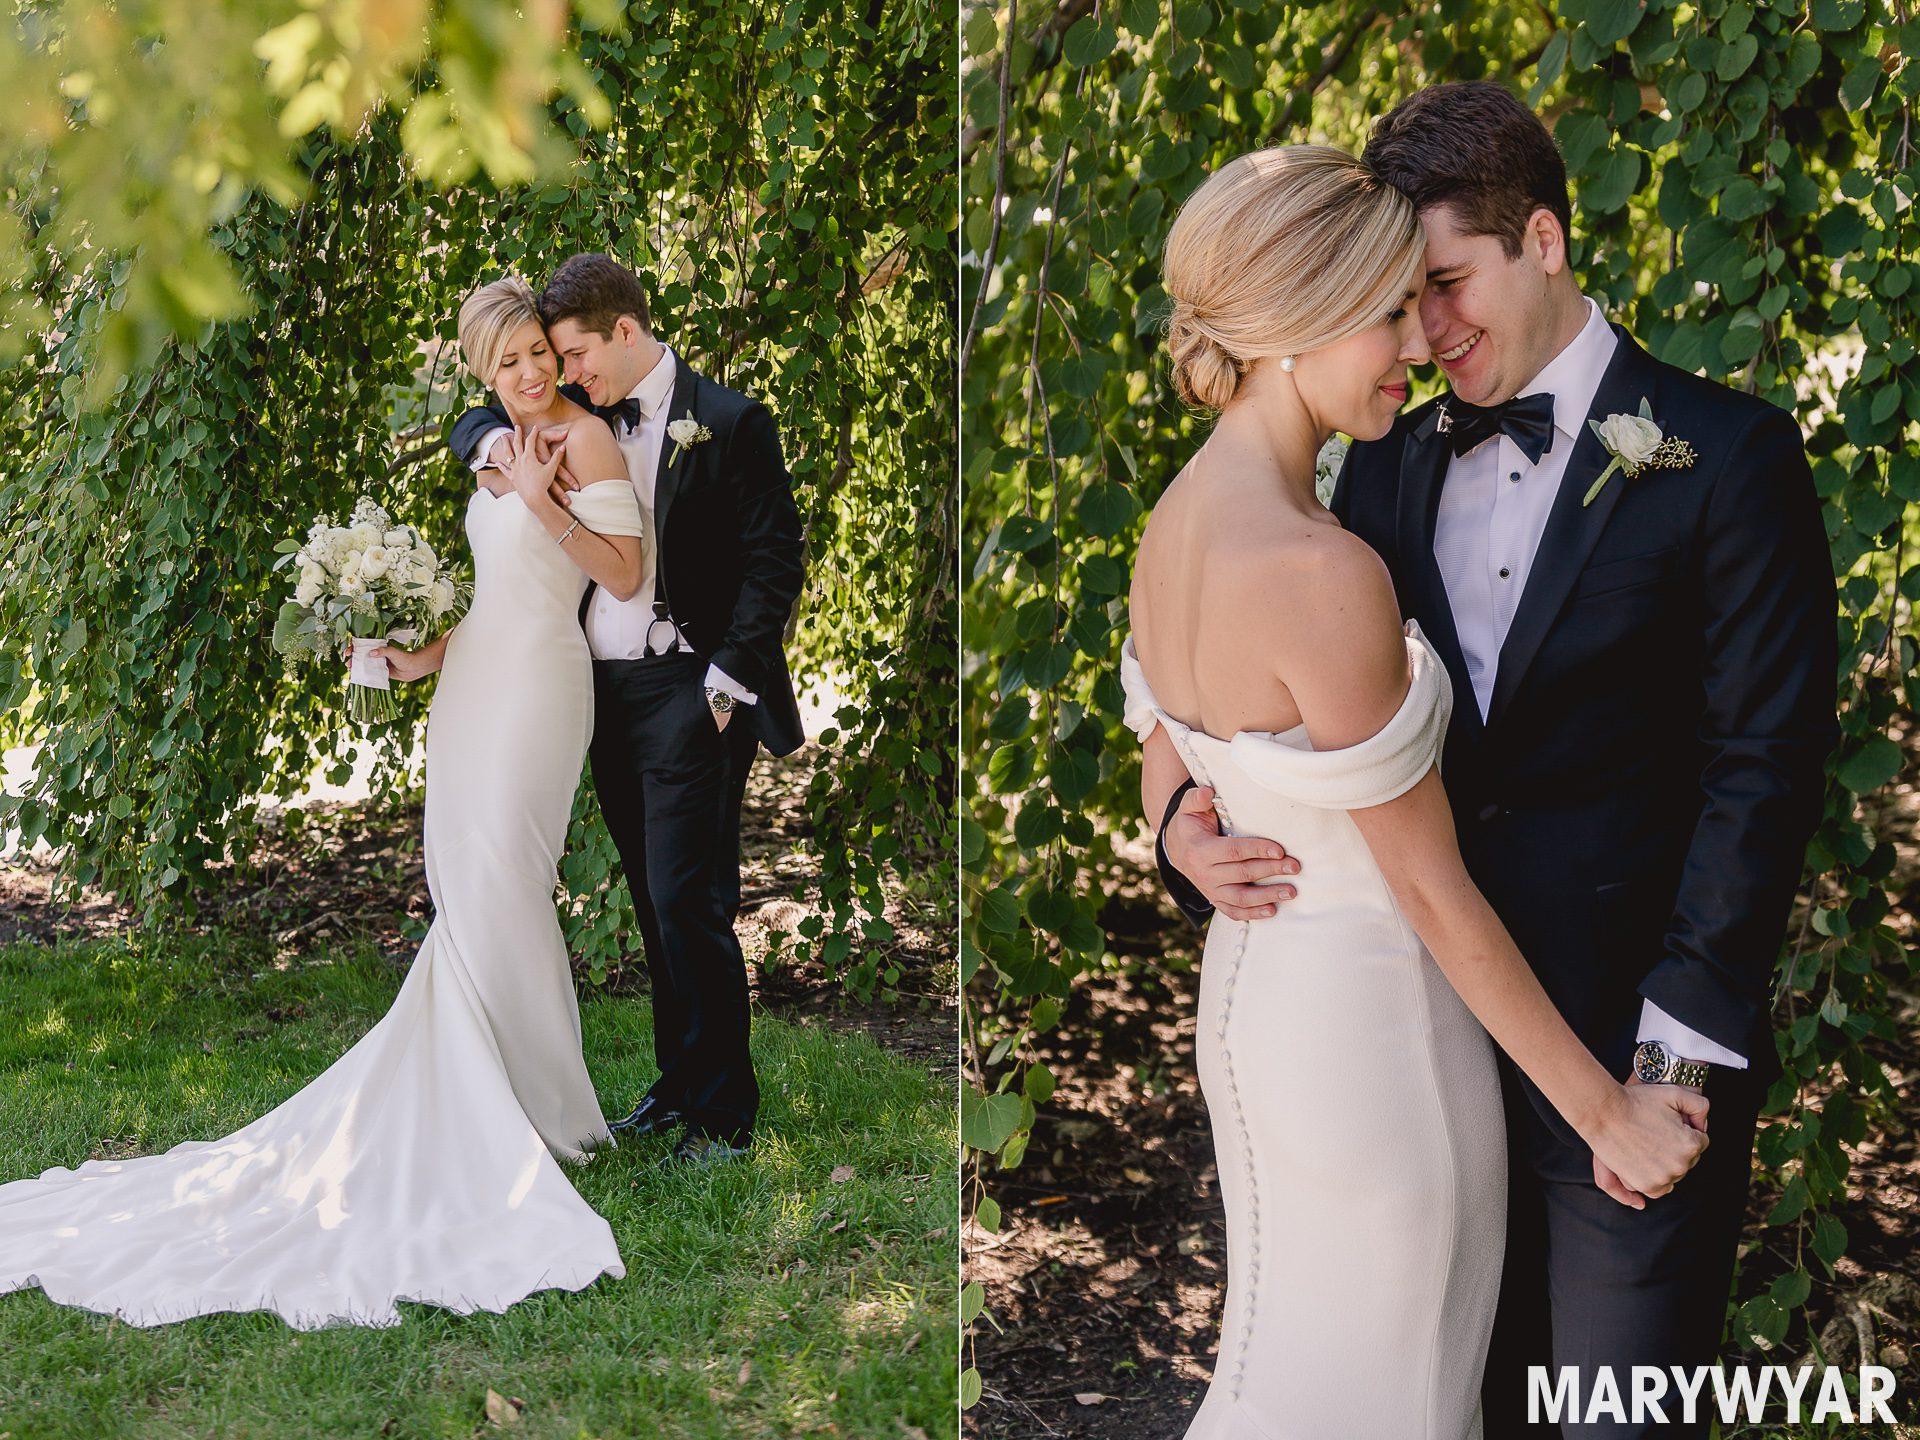 mary wyar blog de fotografía de bodas